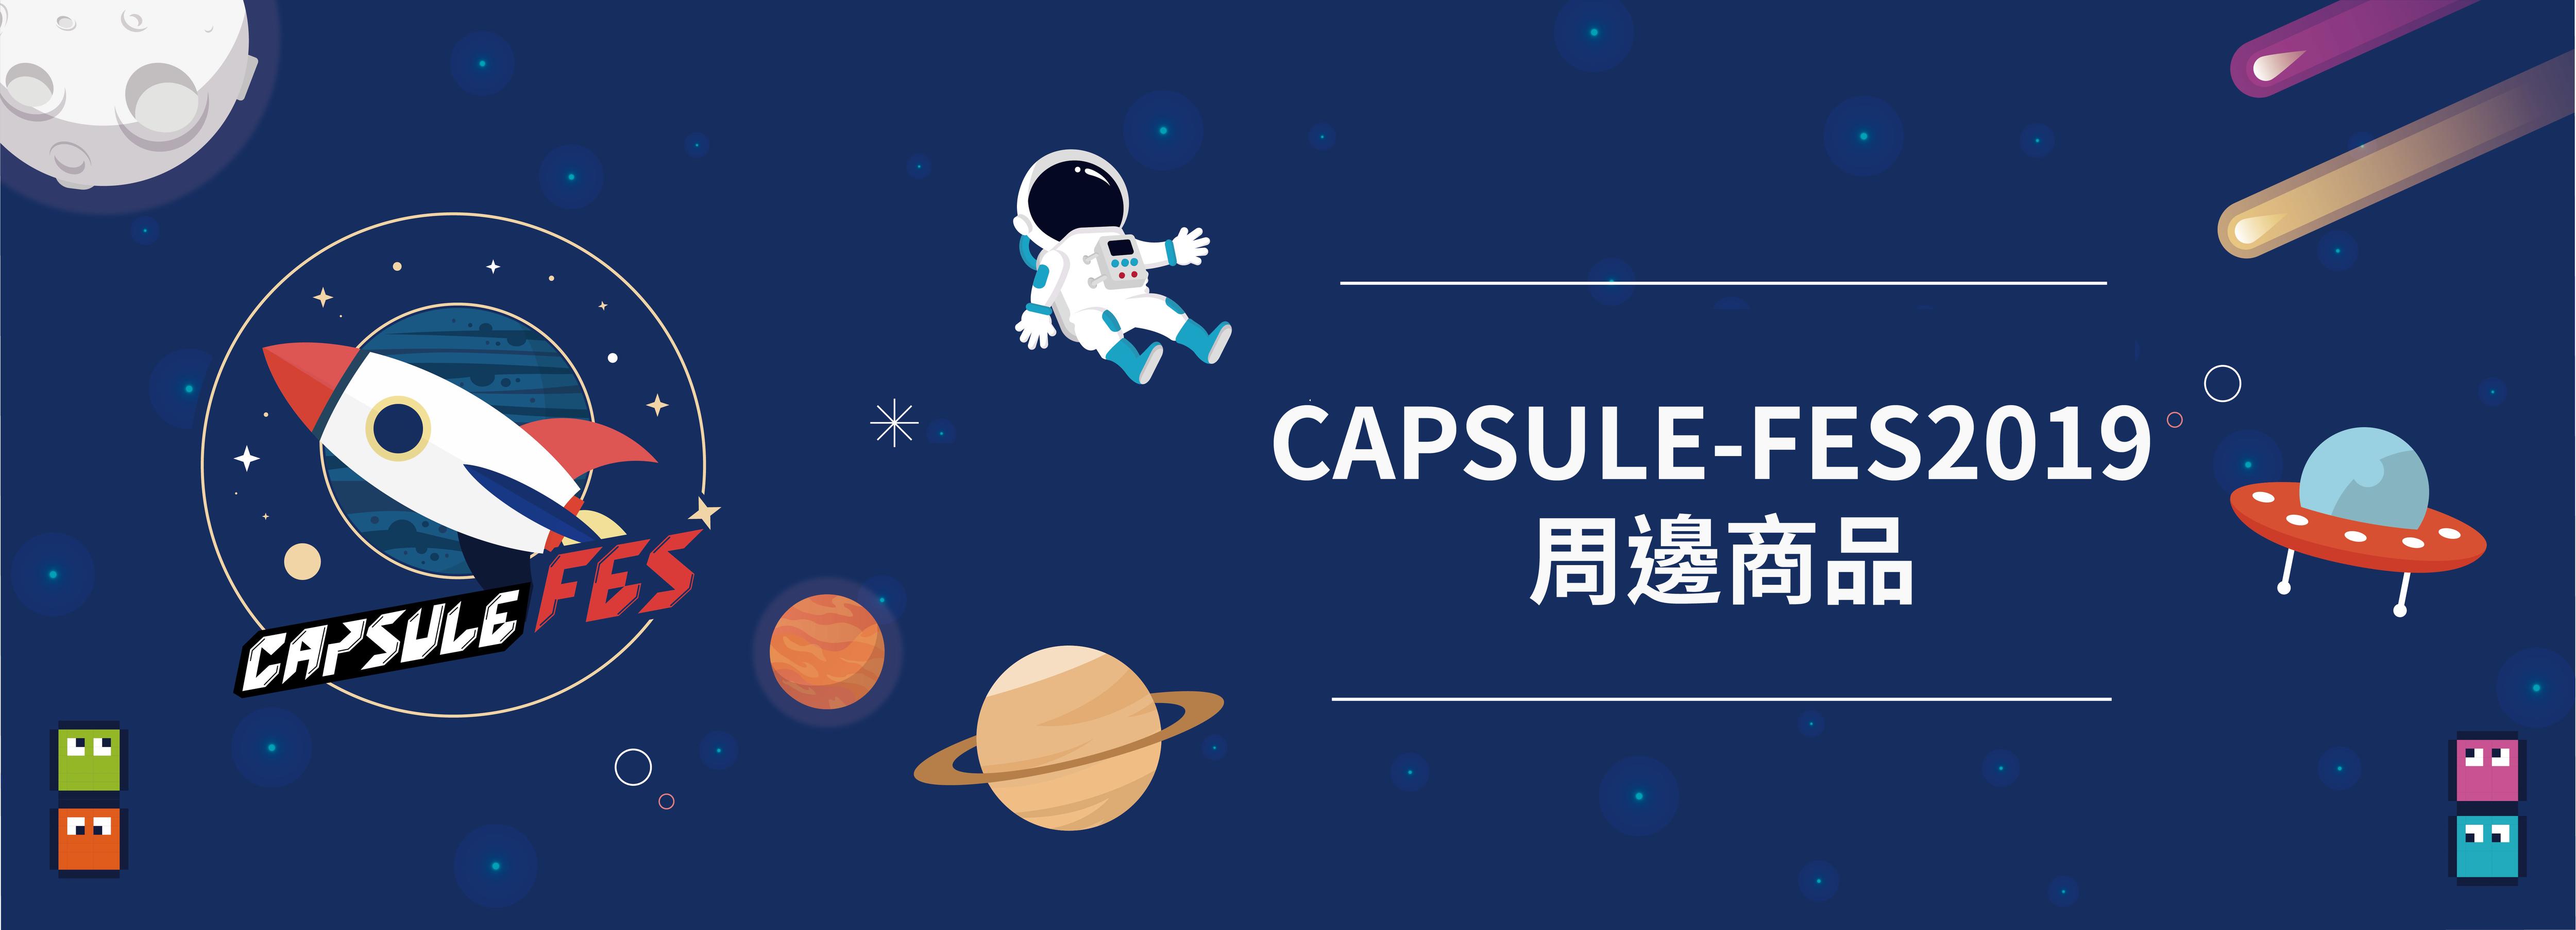 CAPSULE-FES2019